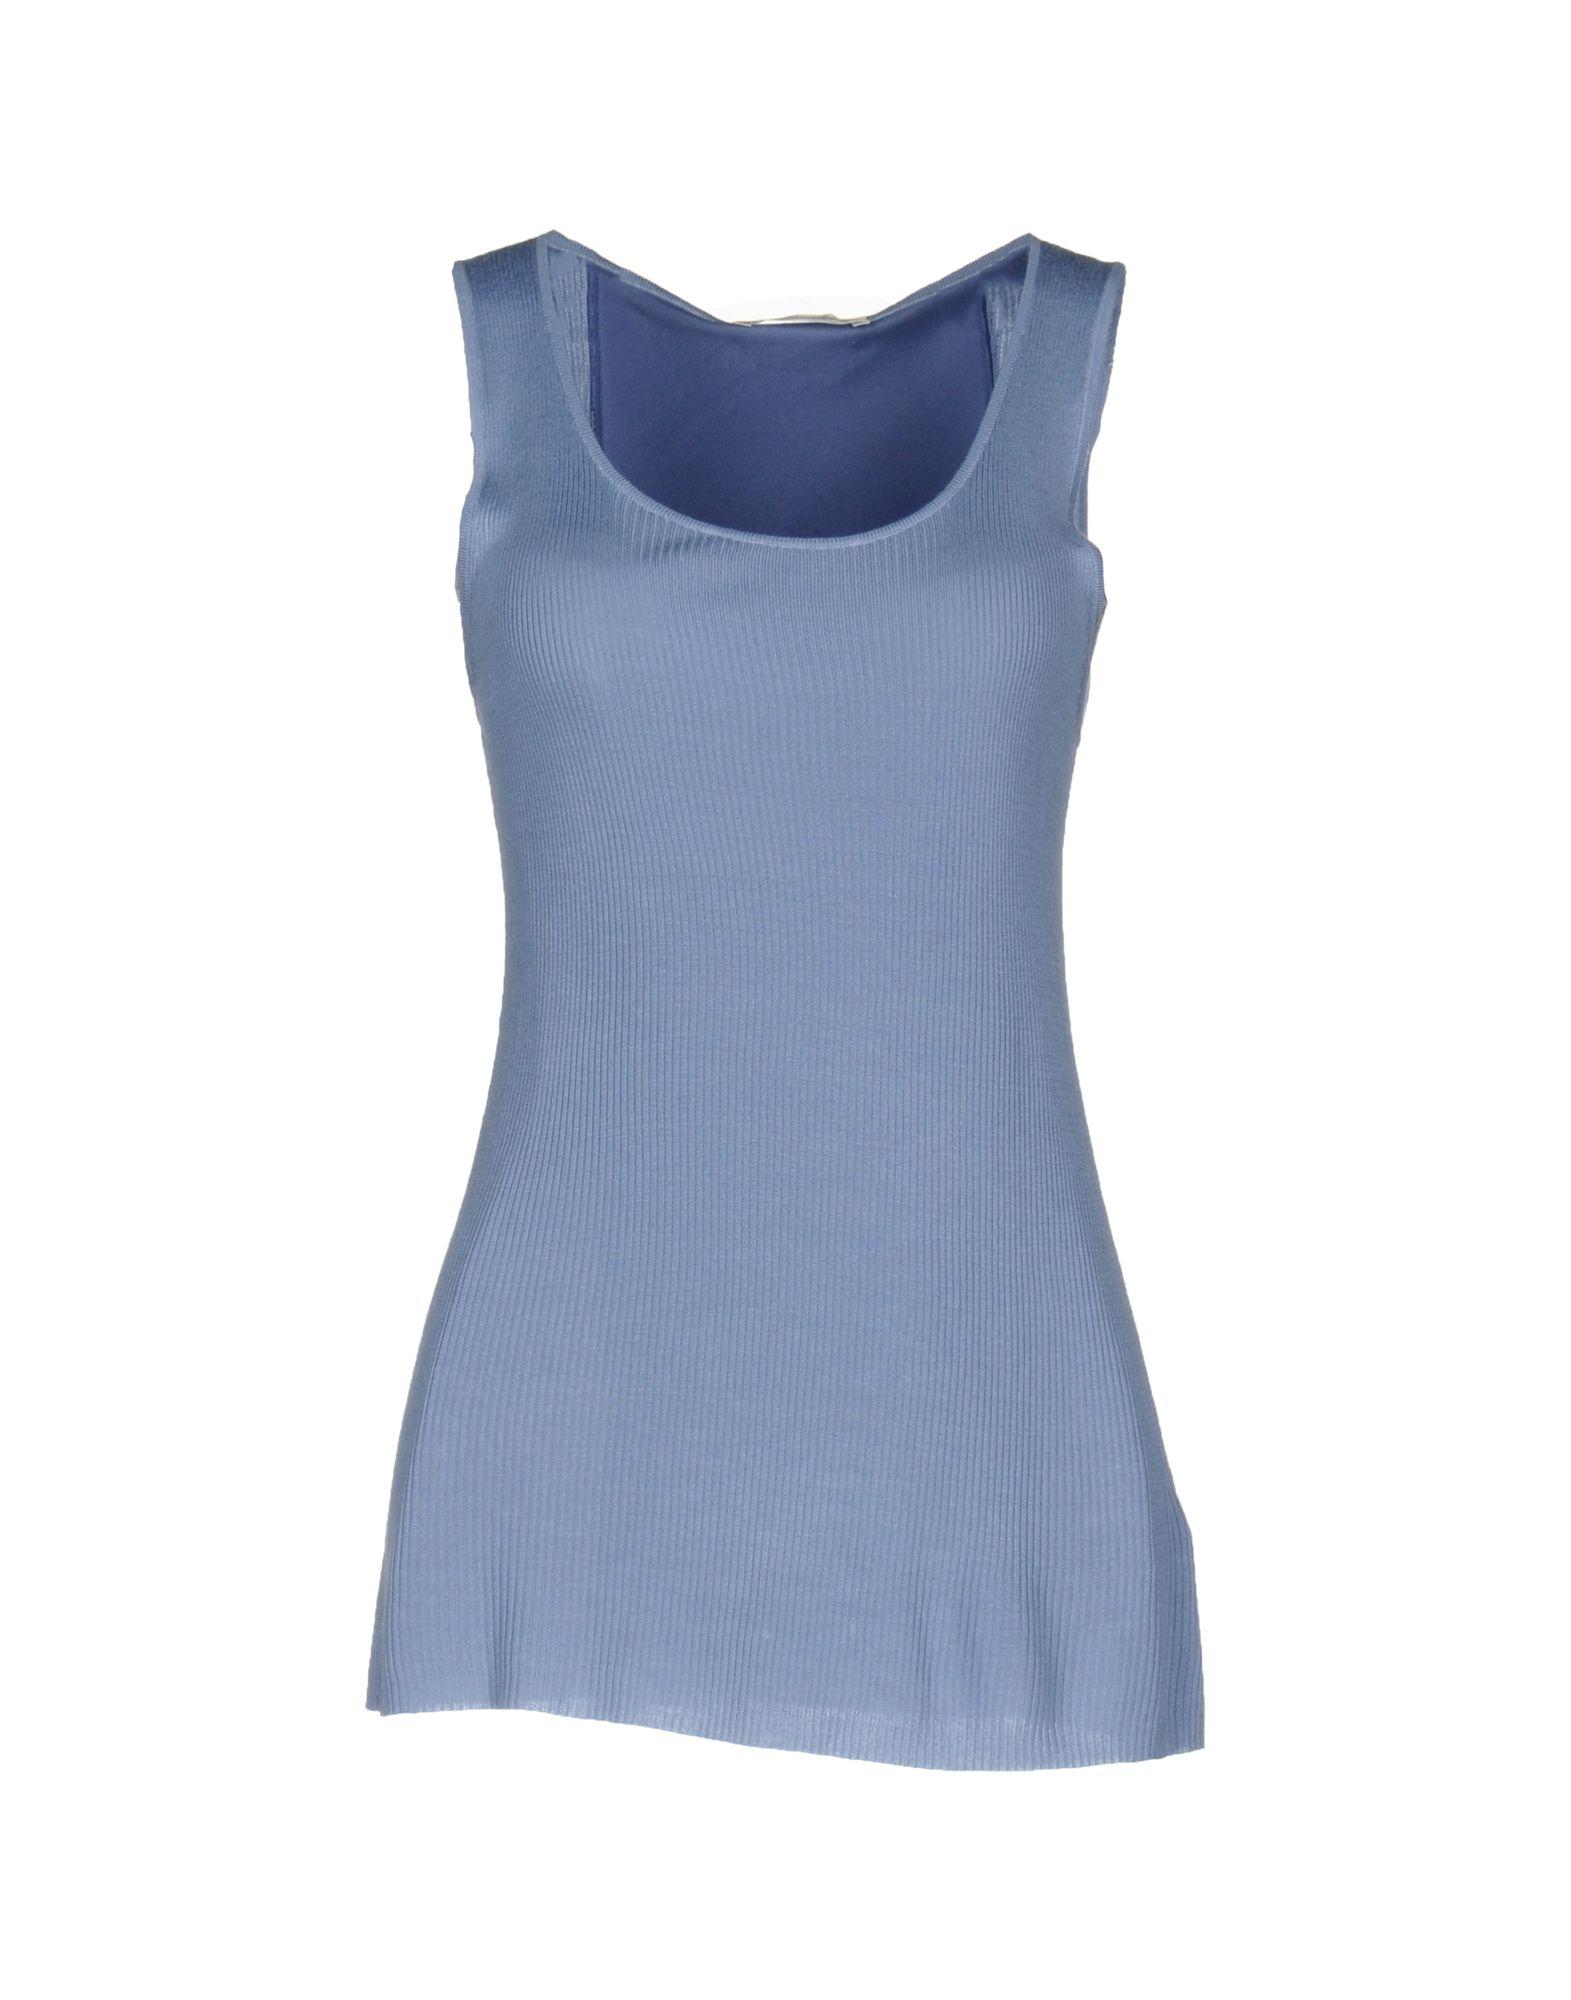 TWIN-SET LINGERIE Damen Ärmelloses Unterhemd Farbe Blaugrau Größe 4 jetztbilligerkaufen